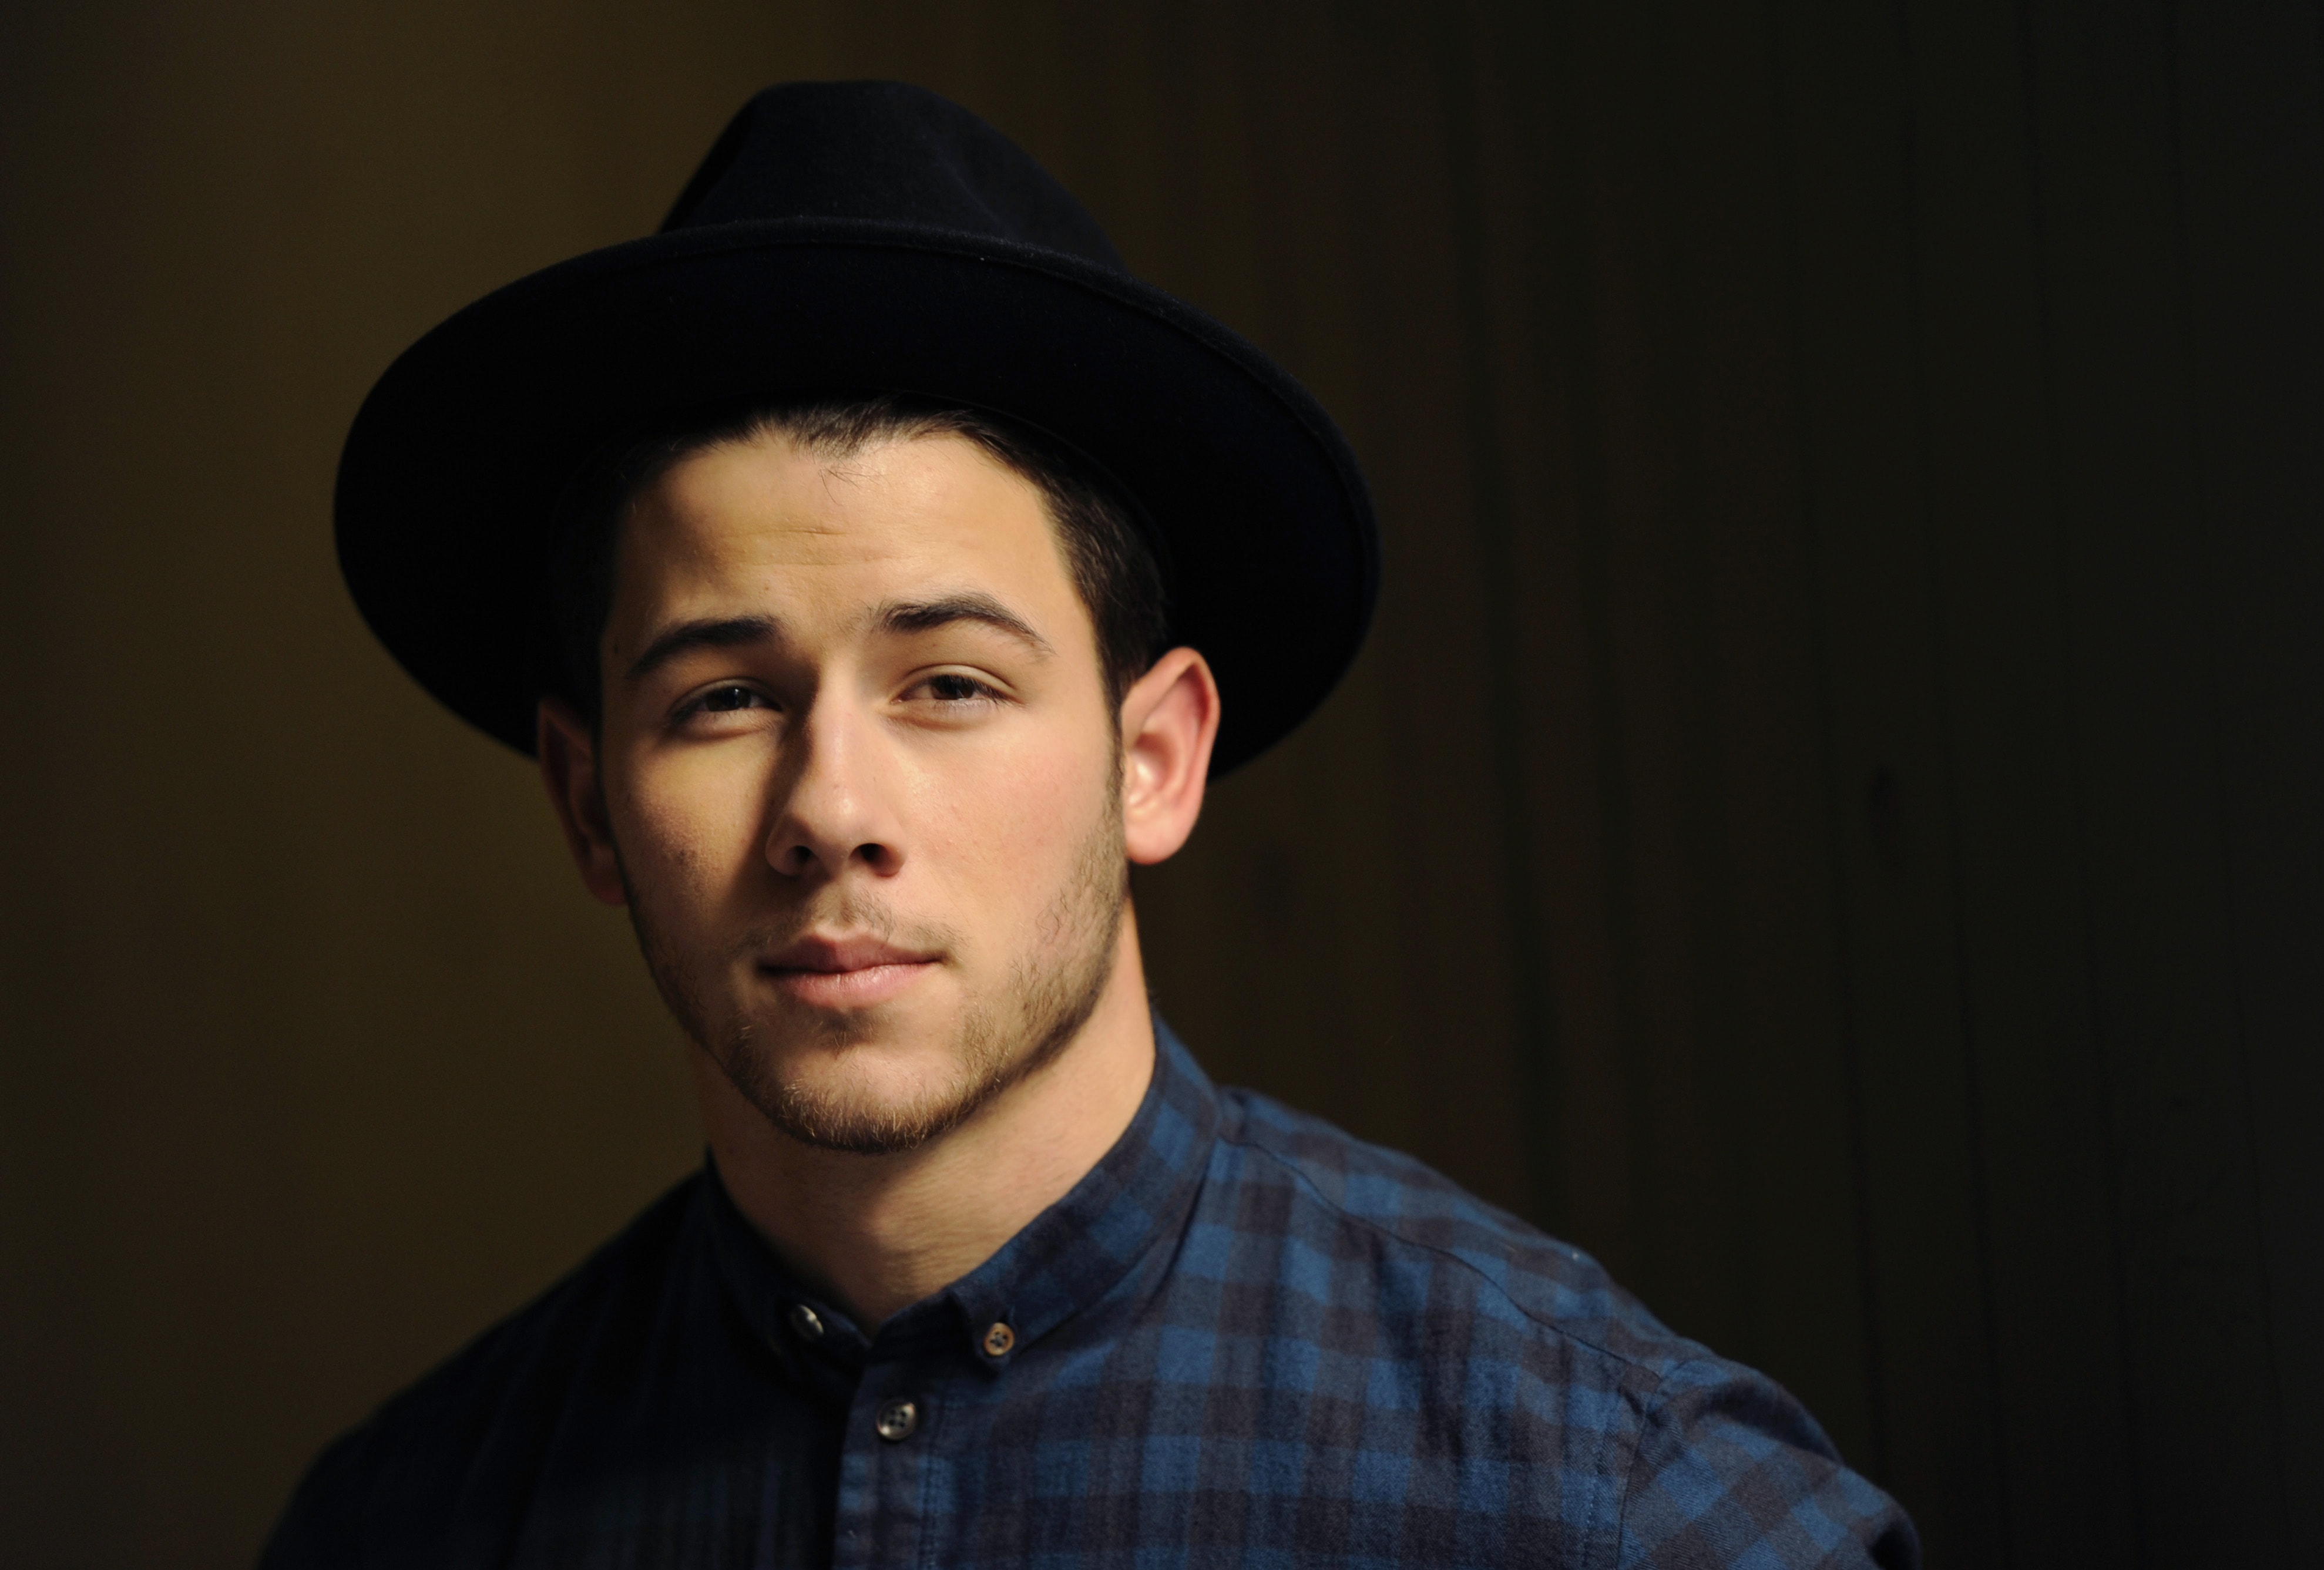 Nick Jonas Wallpapers hd